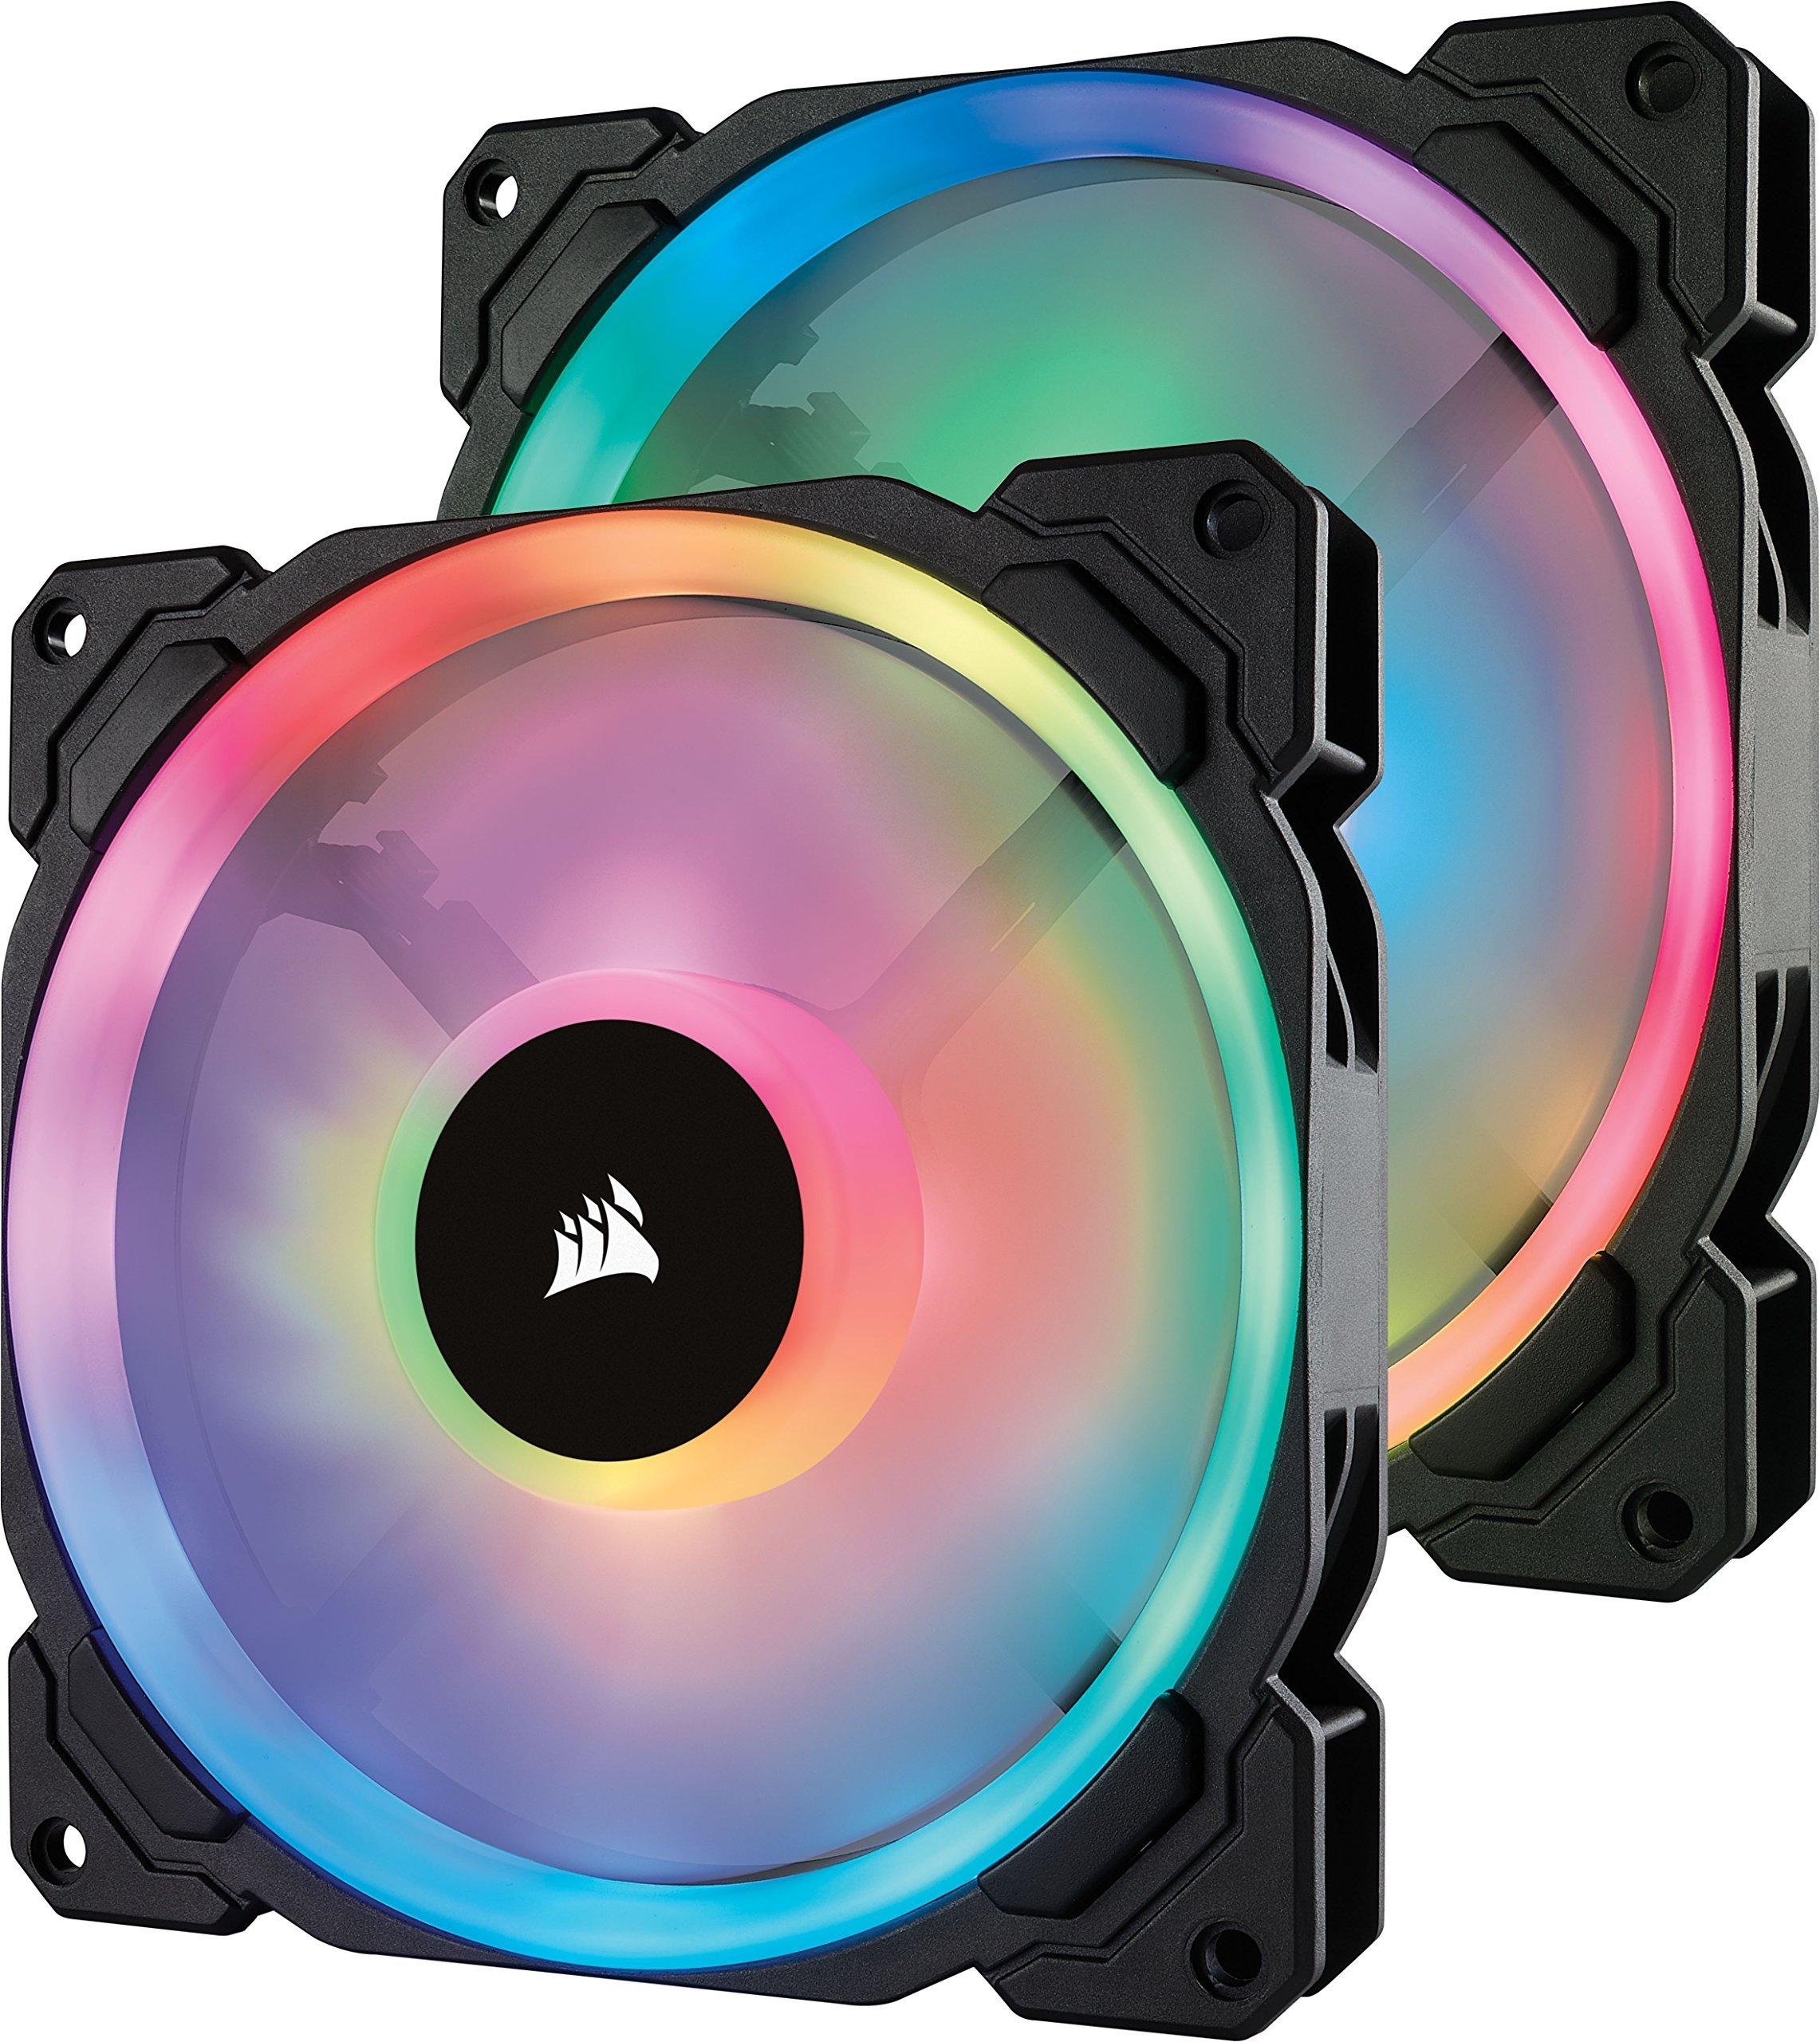 Corsair LL Series LL140 RGB 140mm Dual Light Loop RGB LED PWM Fan 2 Fan Pack with Lighting Node Pro (Renewed) by Corsair